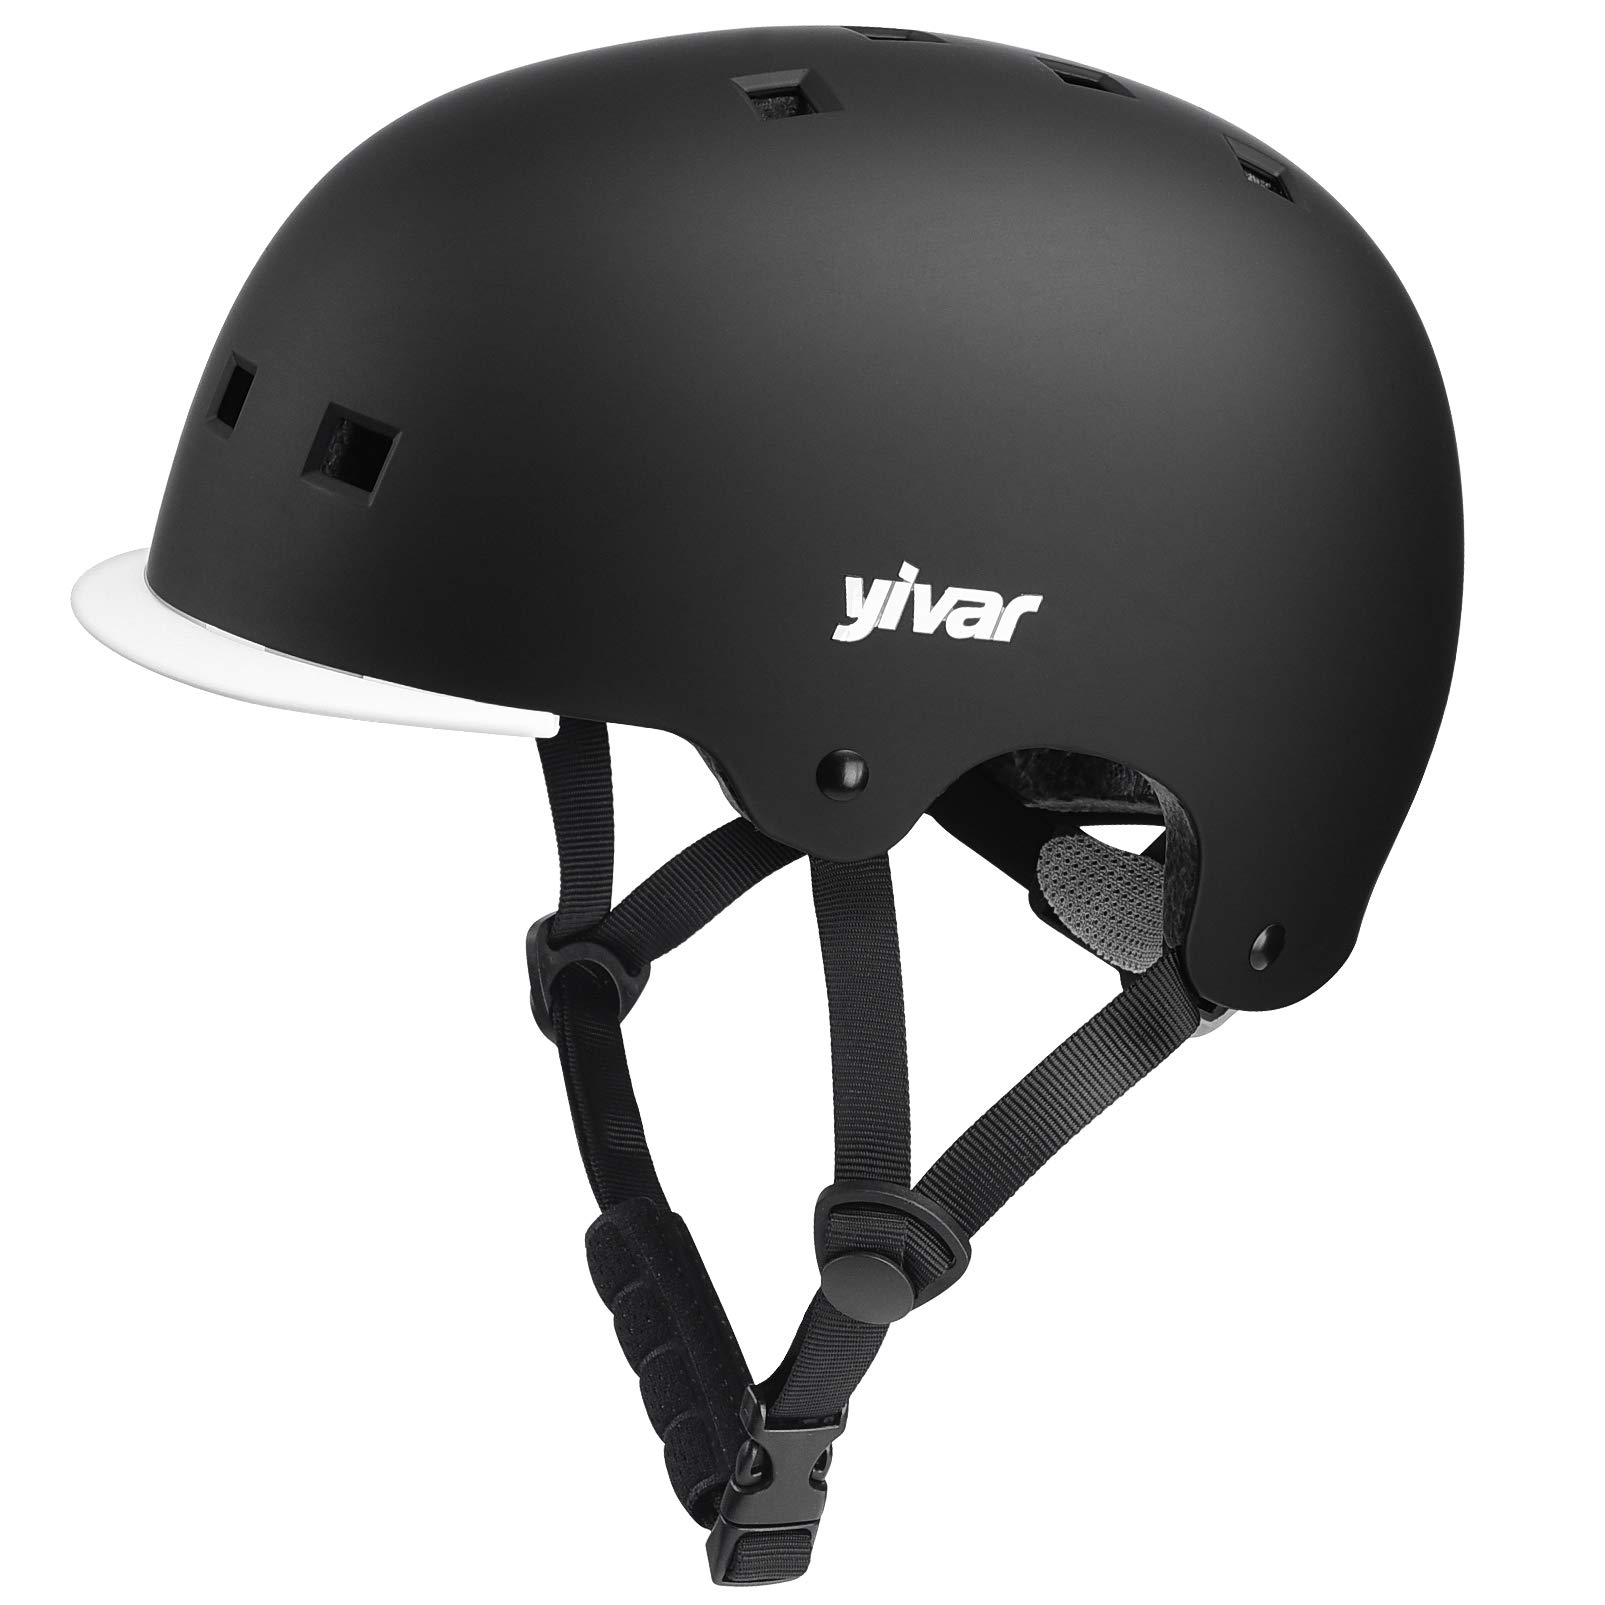 YIVAR Kids Bike Helmet Adjustable Skateboard Helmet with Detachable Visor for Scooter Roller Cycling Skating, 8-13 Years Old Boys Girls